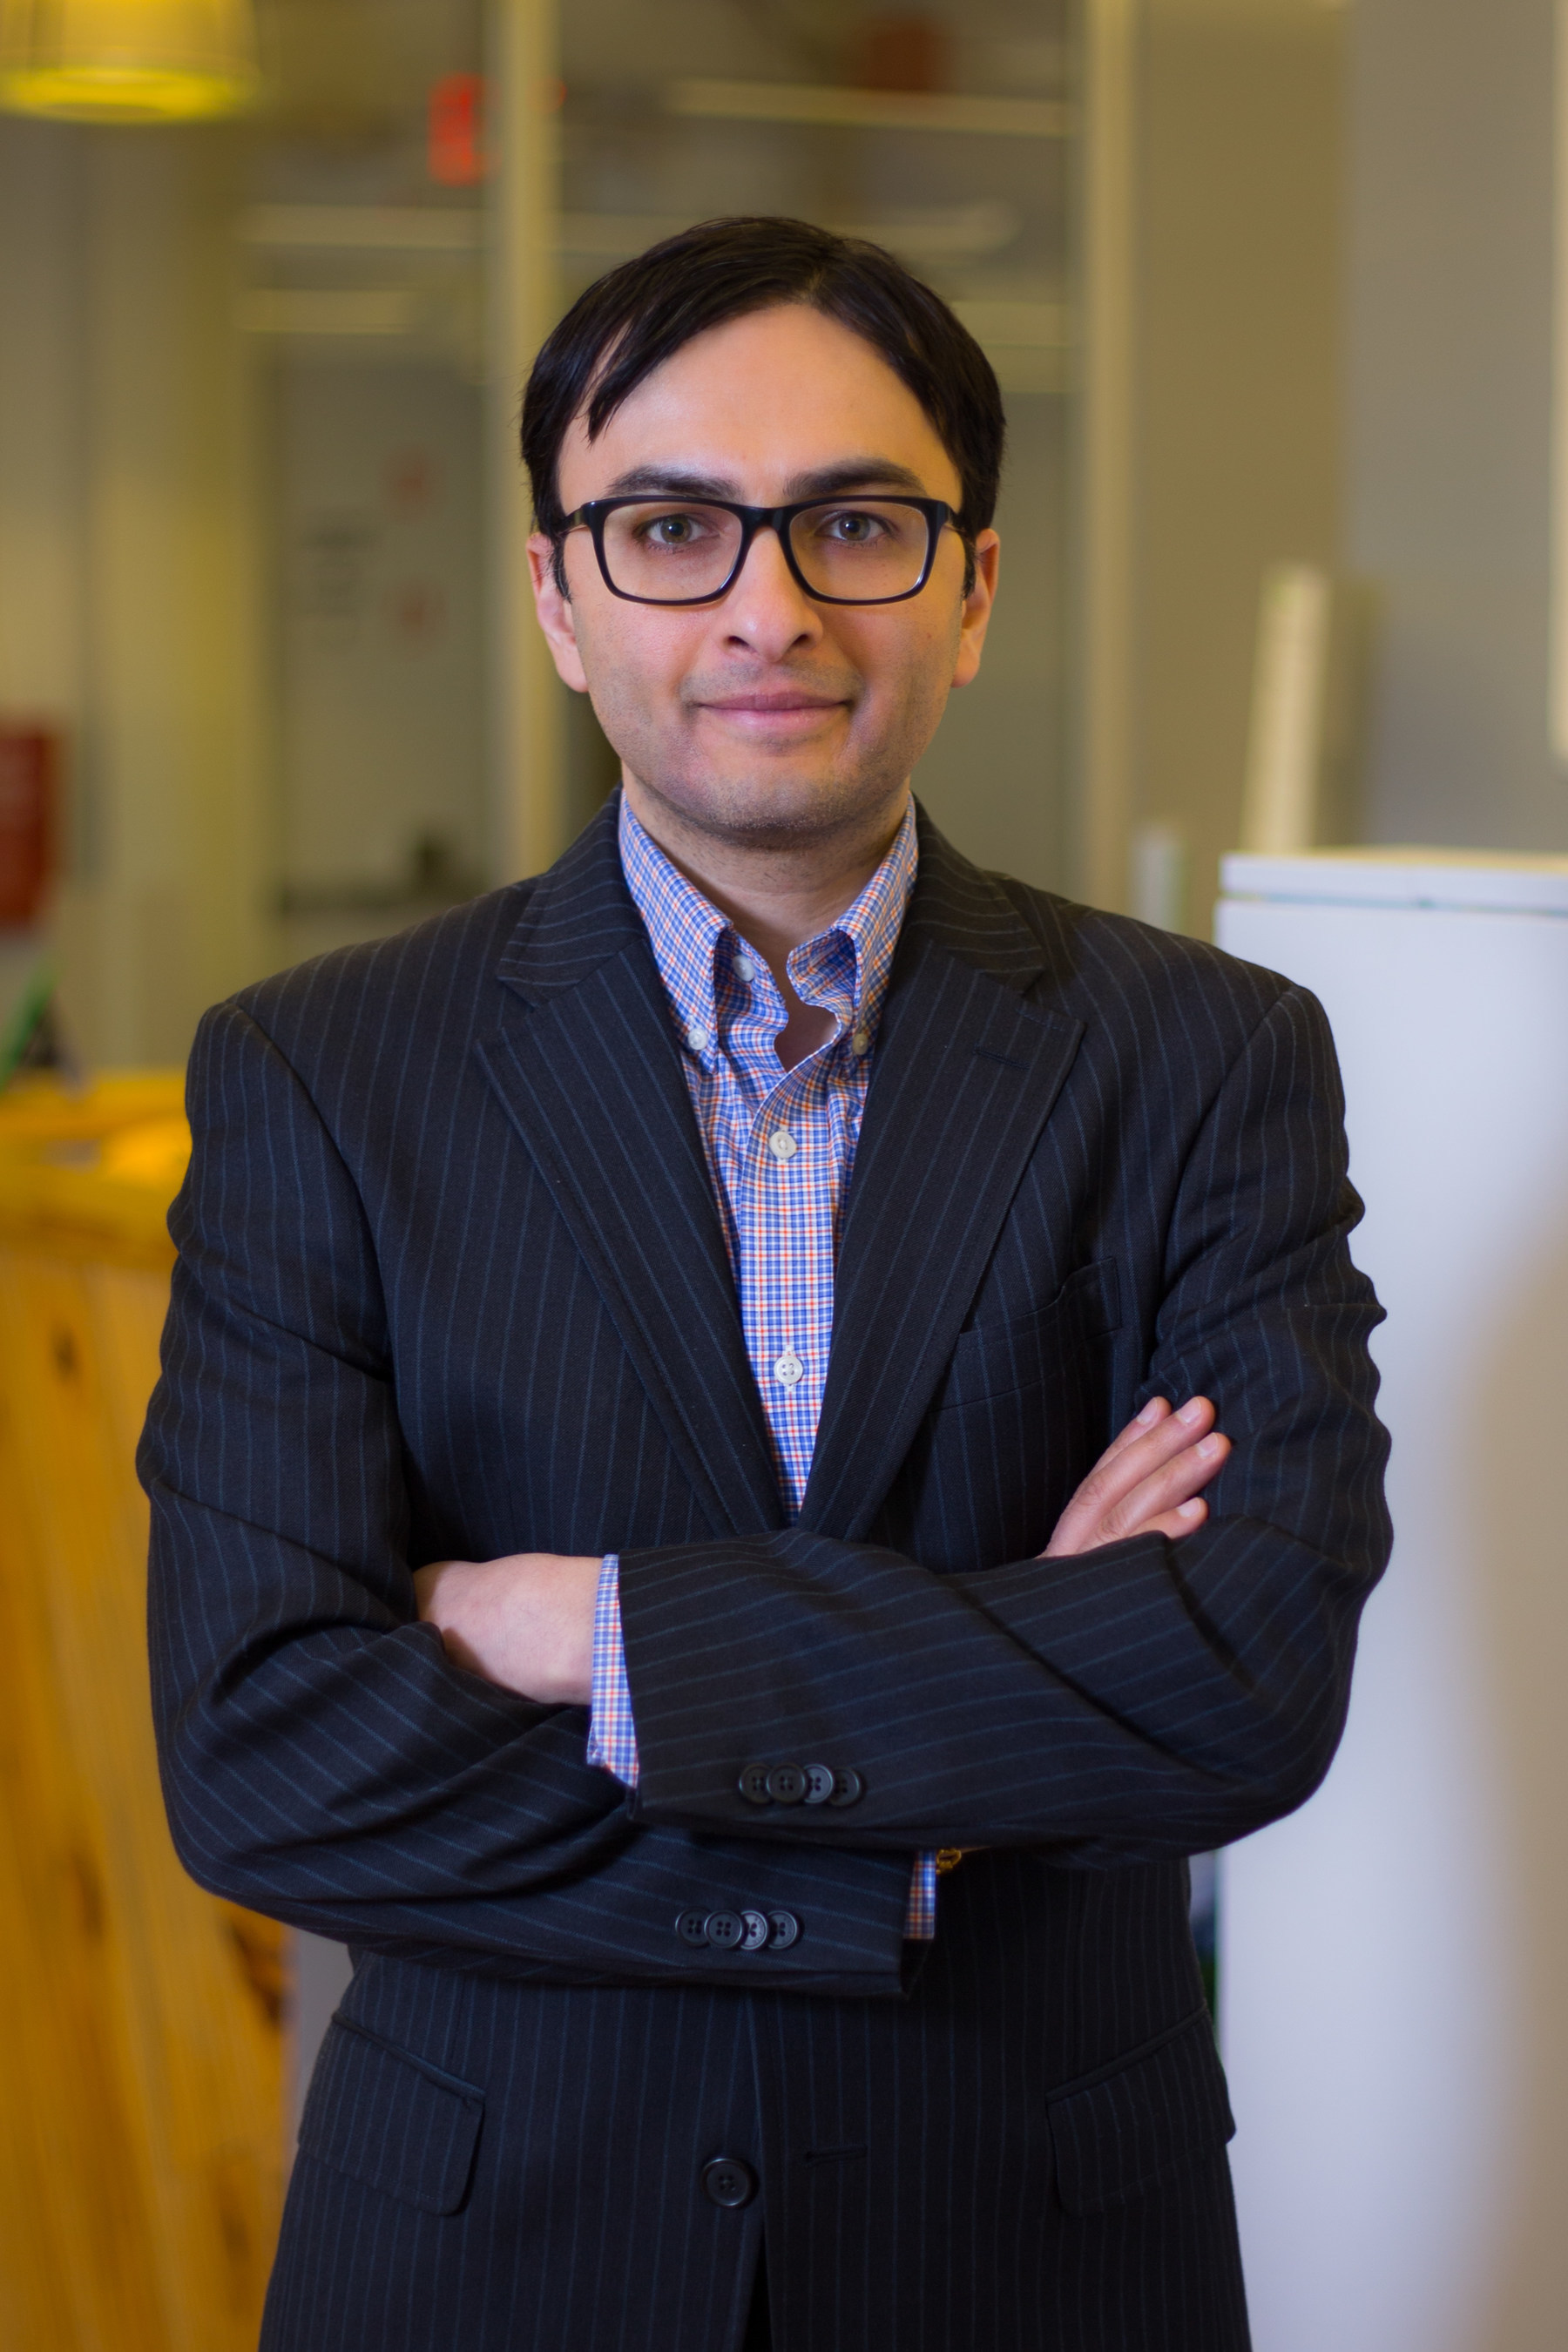 Salil Mehta joins LendKey as Head of Credit Risk & Analytics.